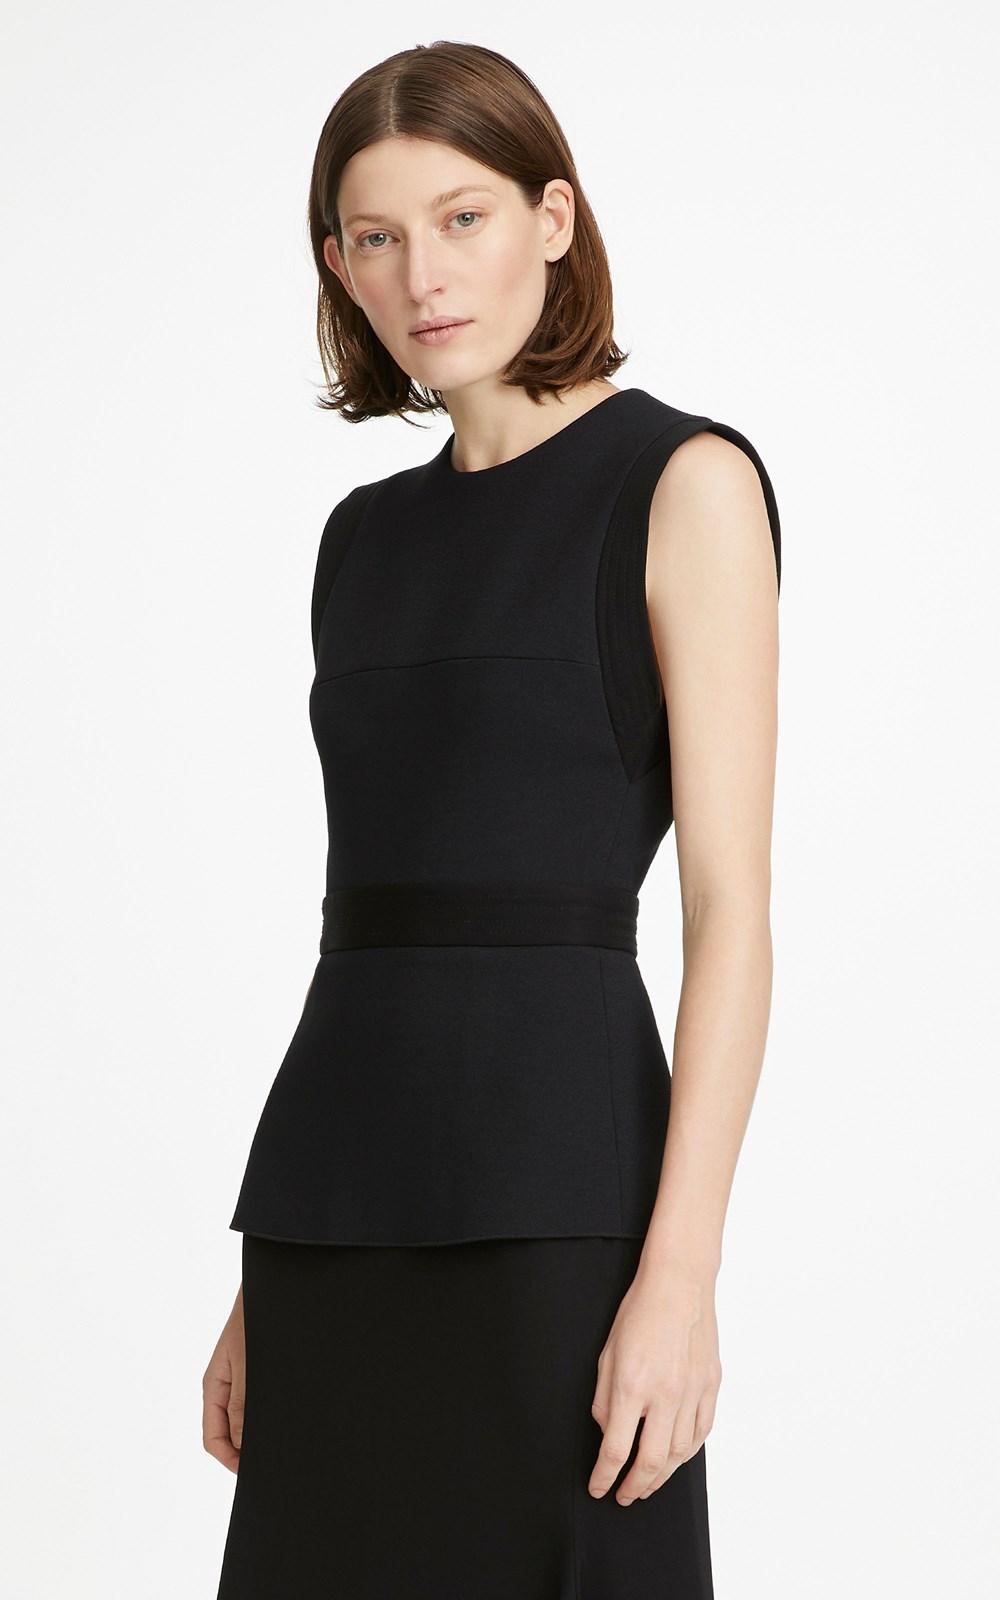 Dresses | BELTED STITCH DRAPE DRESS